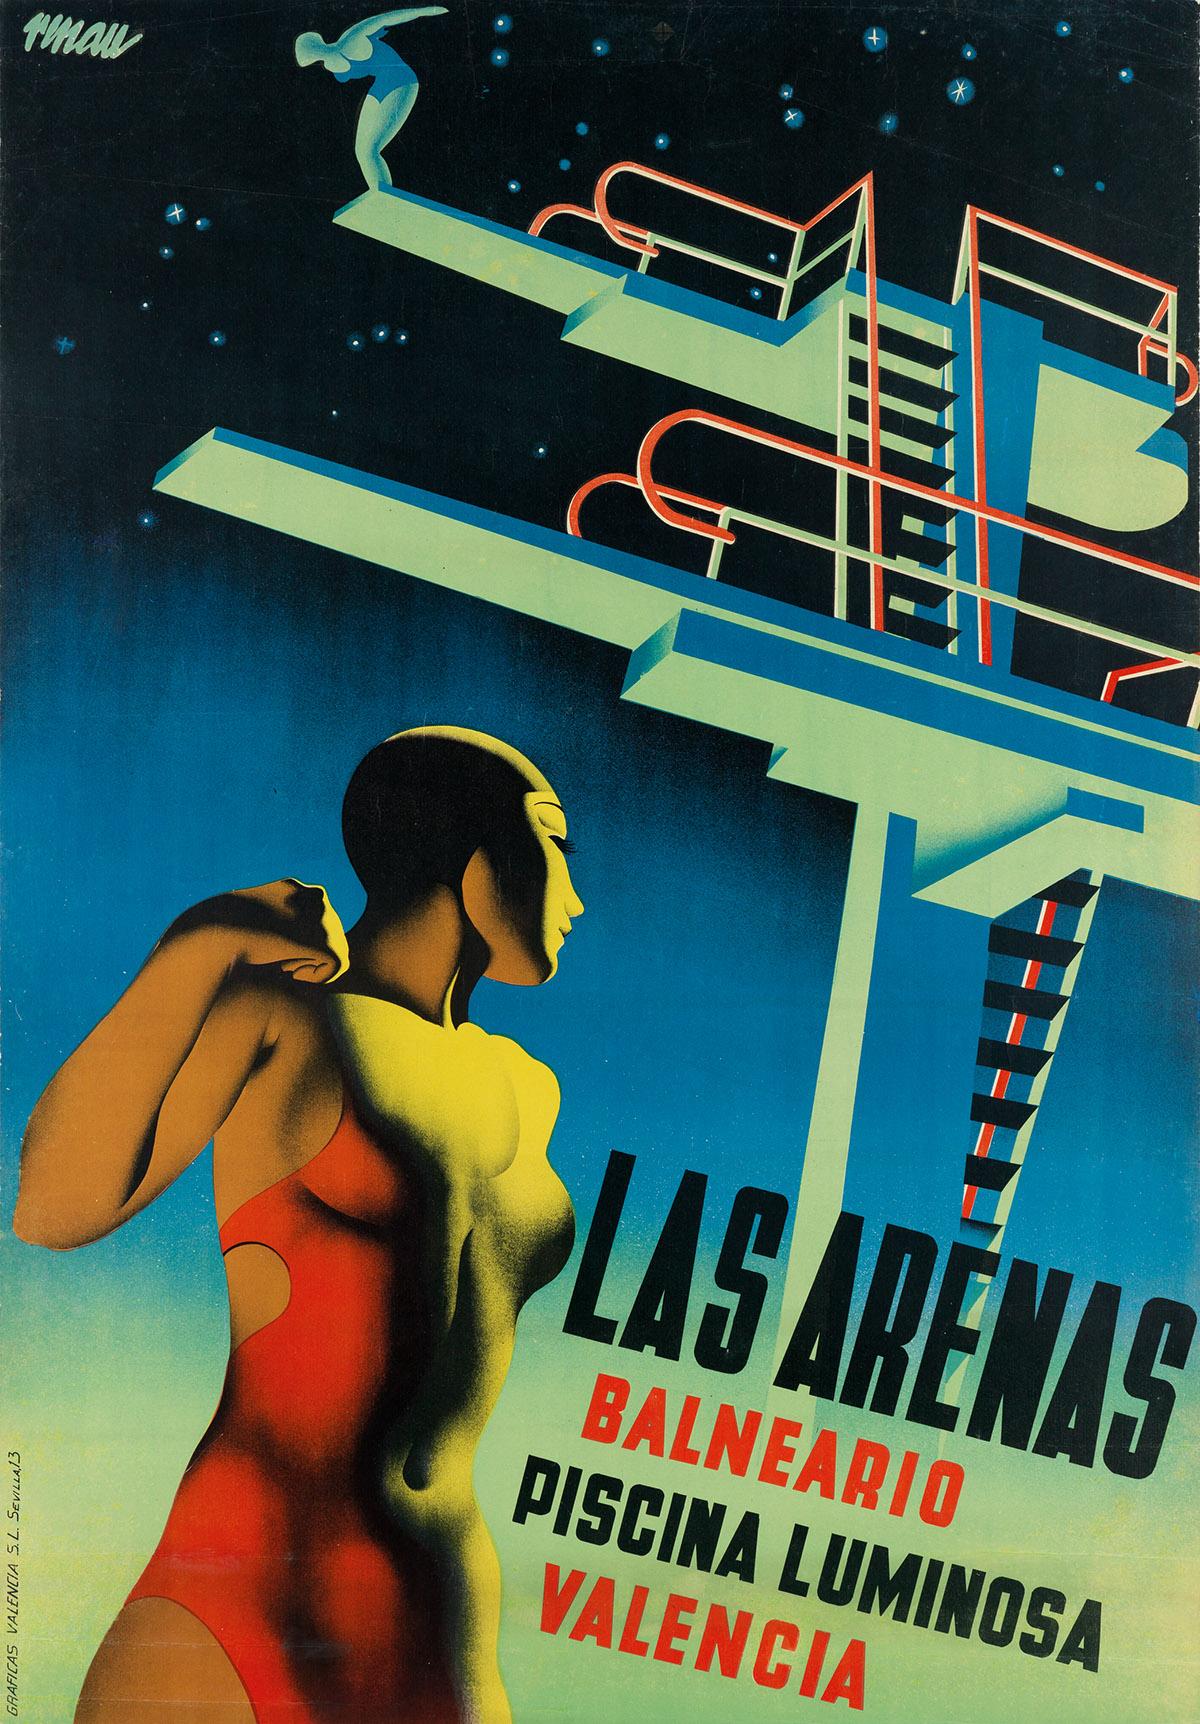 JOSEP RENAU MONTORO (1907-1982). LAS ARENAS BALNEARIO PISCINA LUMINOSA. 1932. 39x27 inches, 99x68 cm. Graficas Valencia, Sevilla.